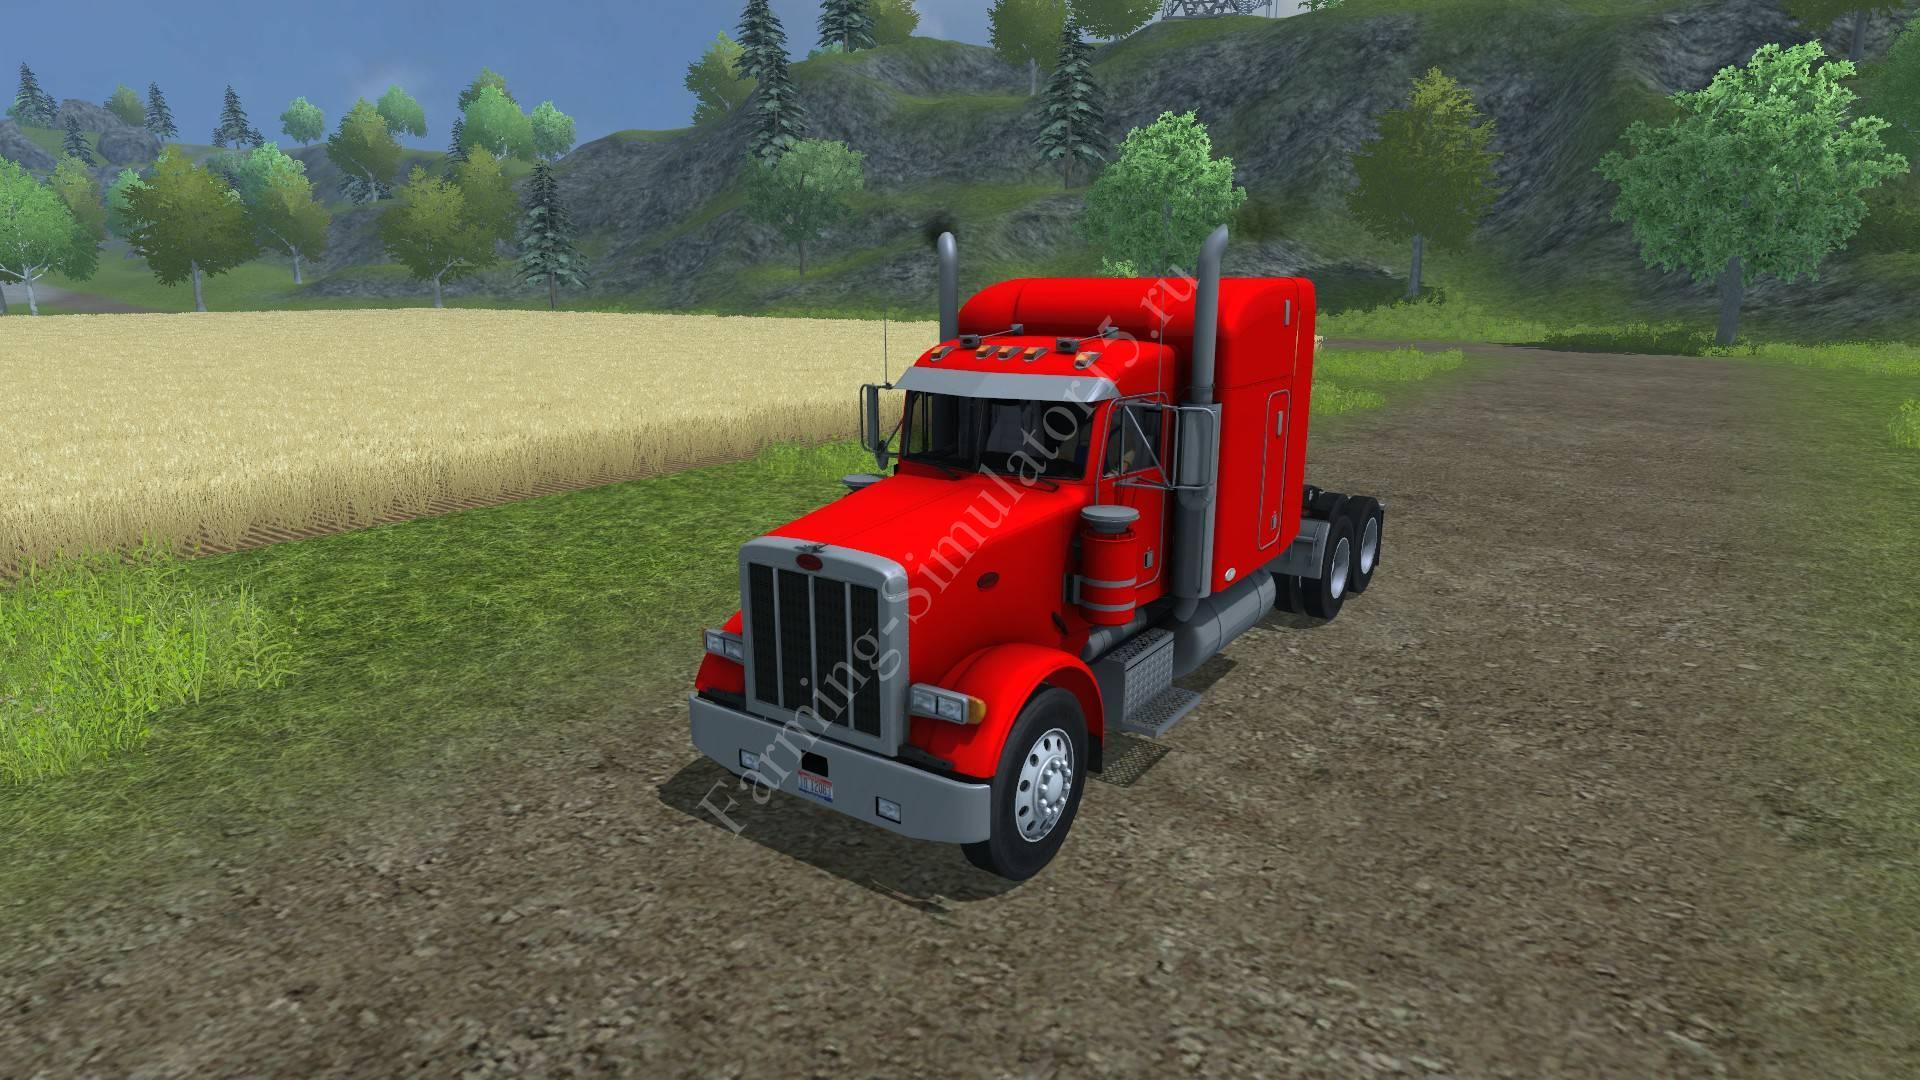 Мод грузовика Peterbilt 378 v 2.0 Farming Simulator 2013, Farming Simulator 2015